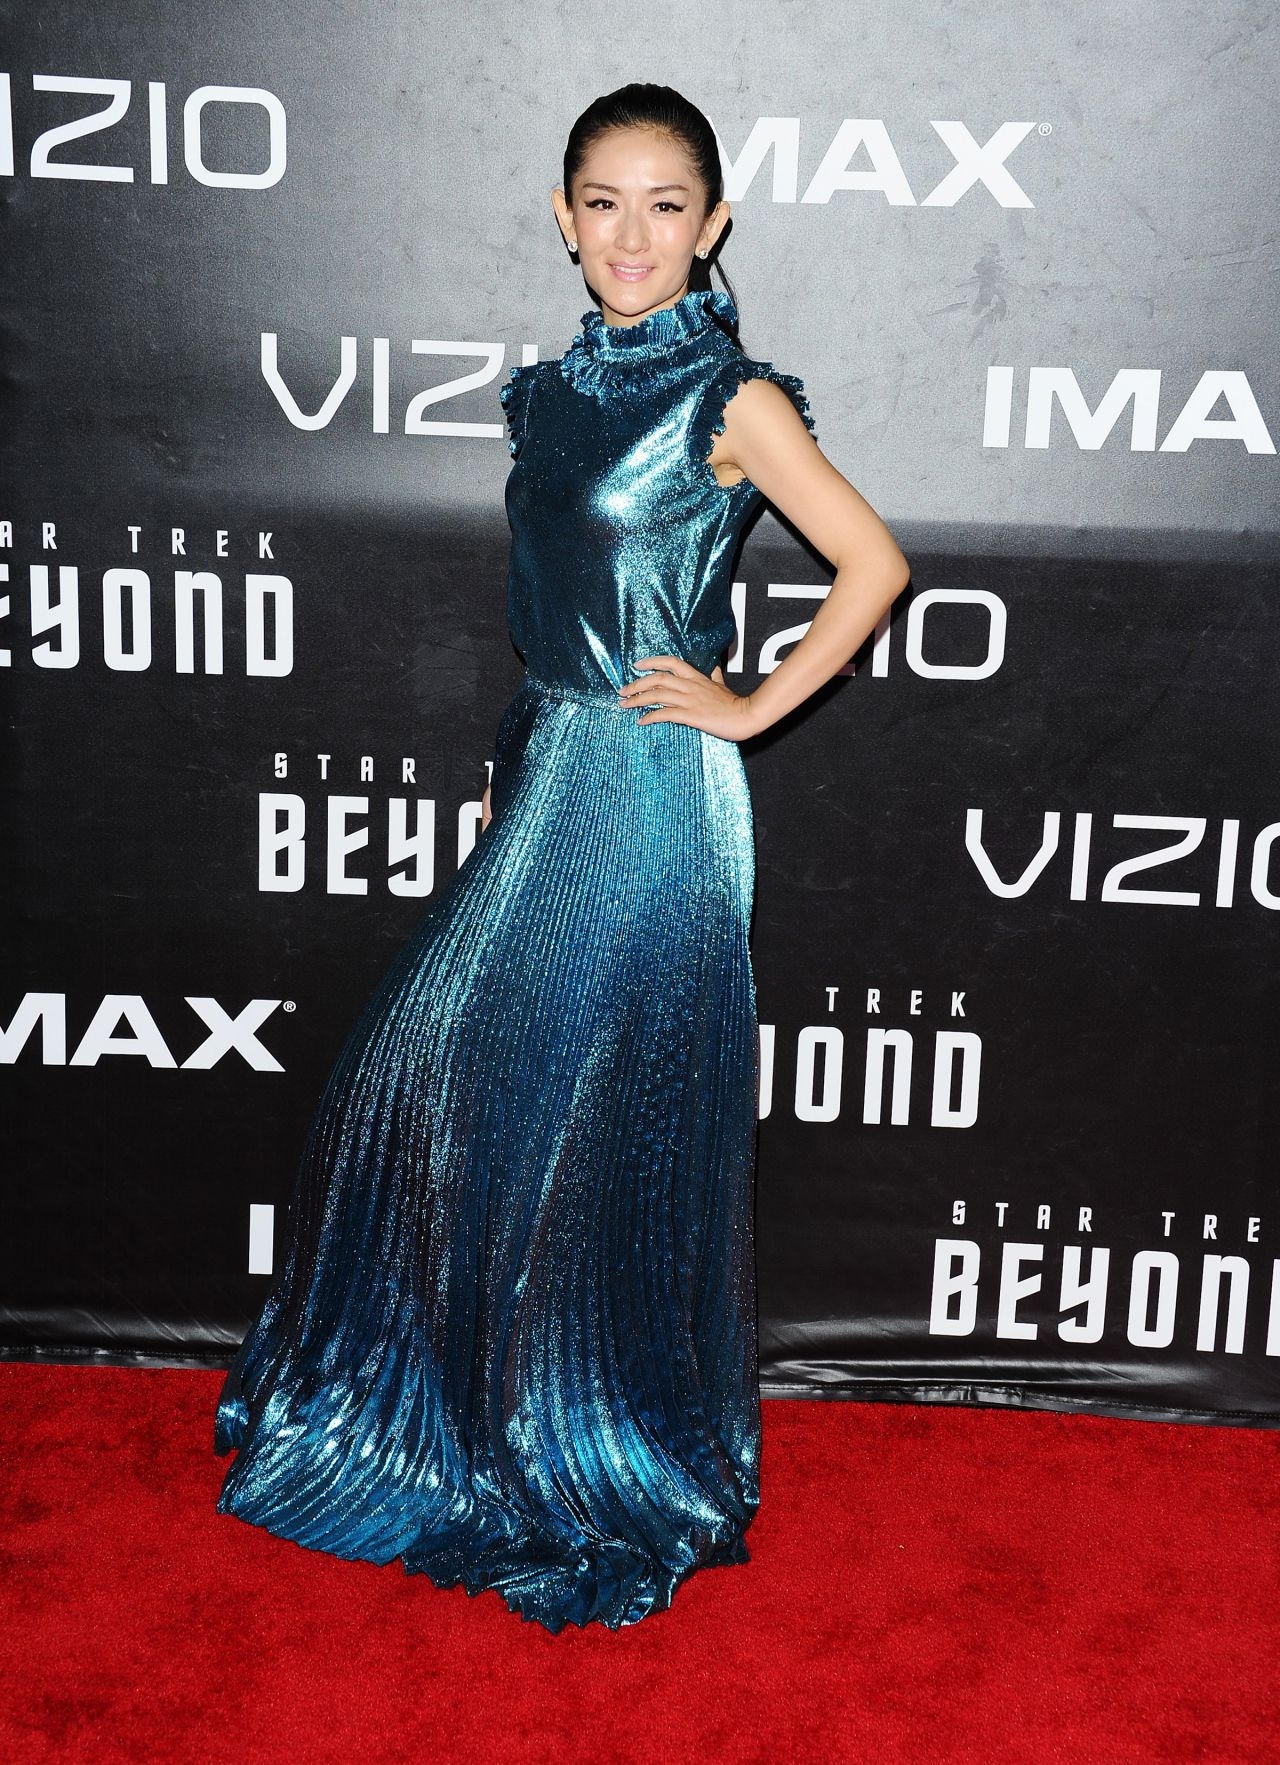 Xie Na Paramount Pictures Star Trek Beyond Premiere